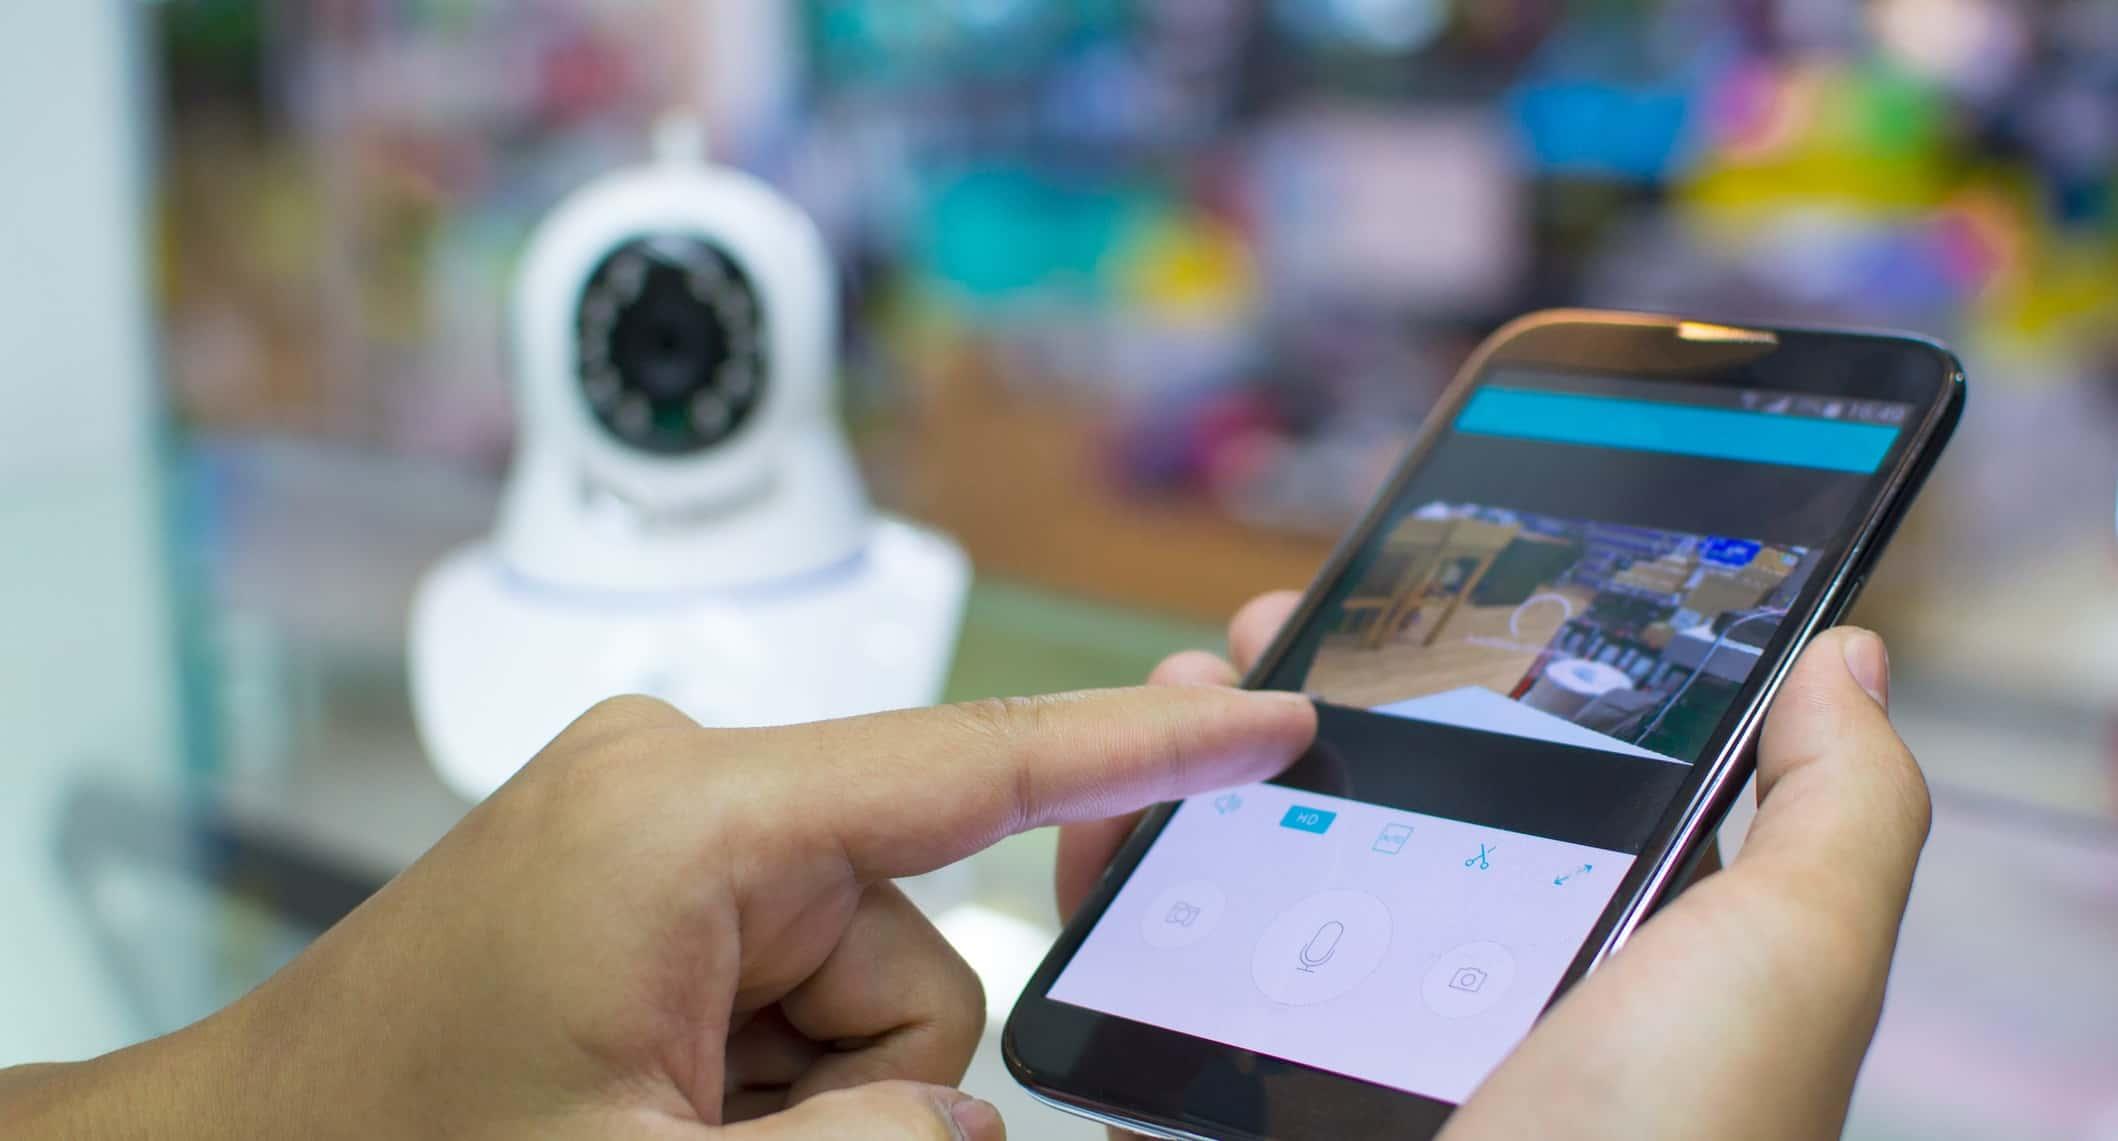 image de mains tenant smartphone camera